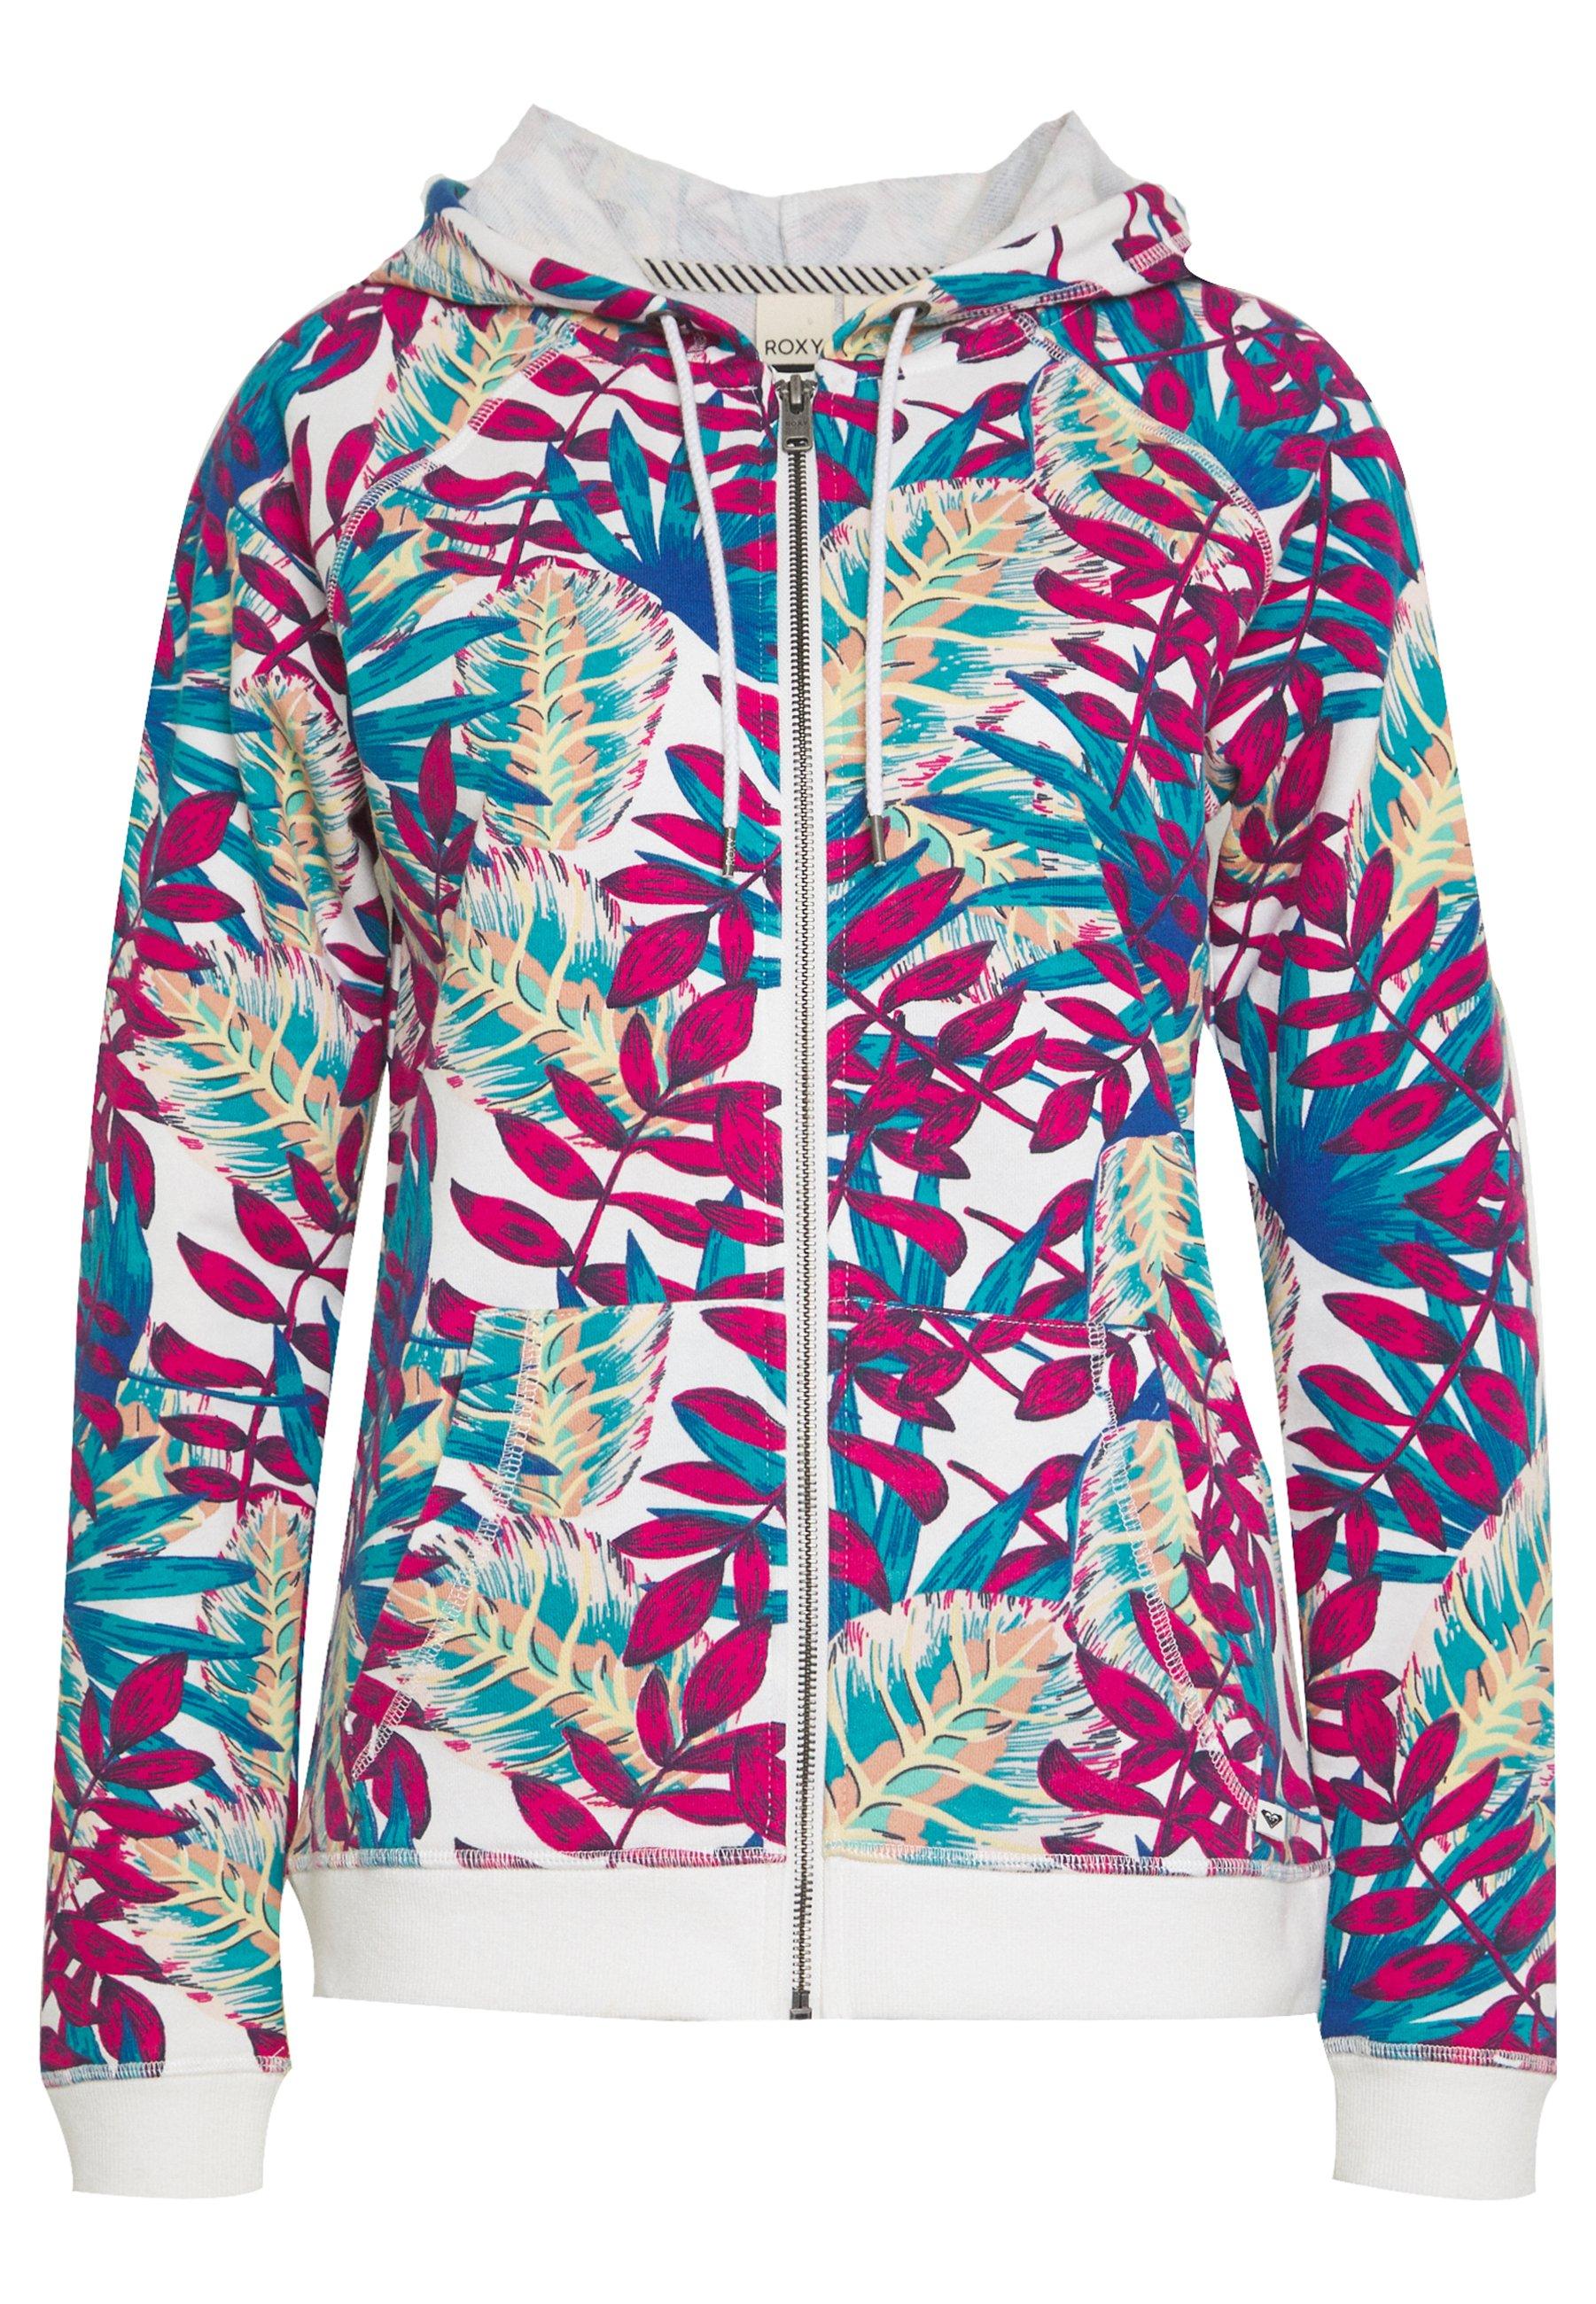 Roxy GOING RIGHT veste en sweat zippée snow white